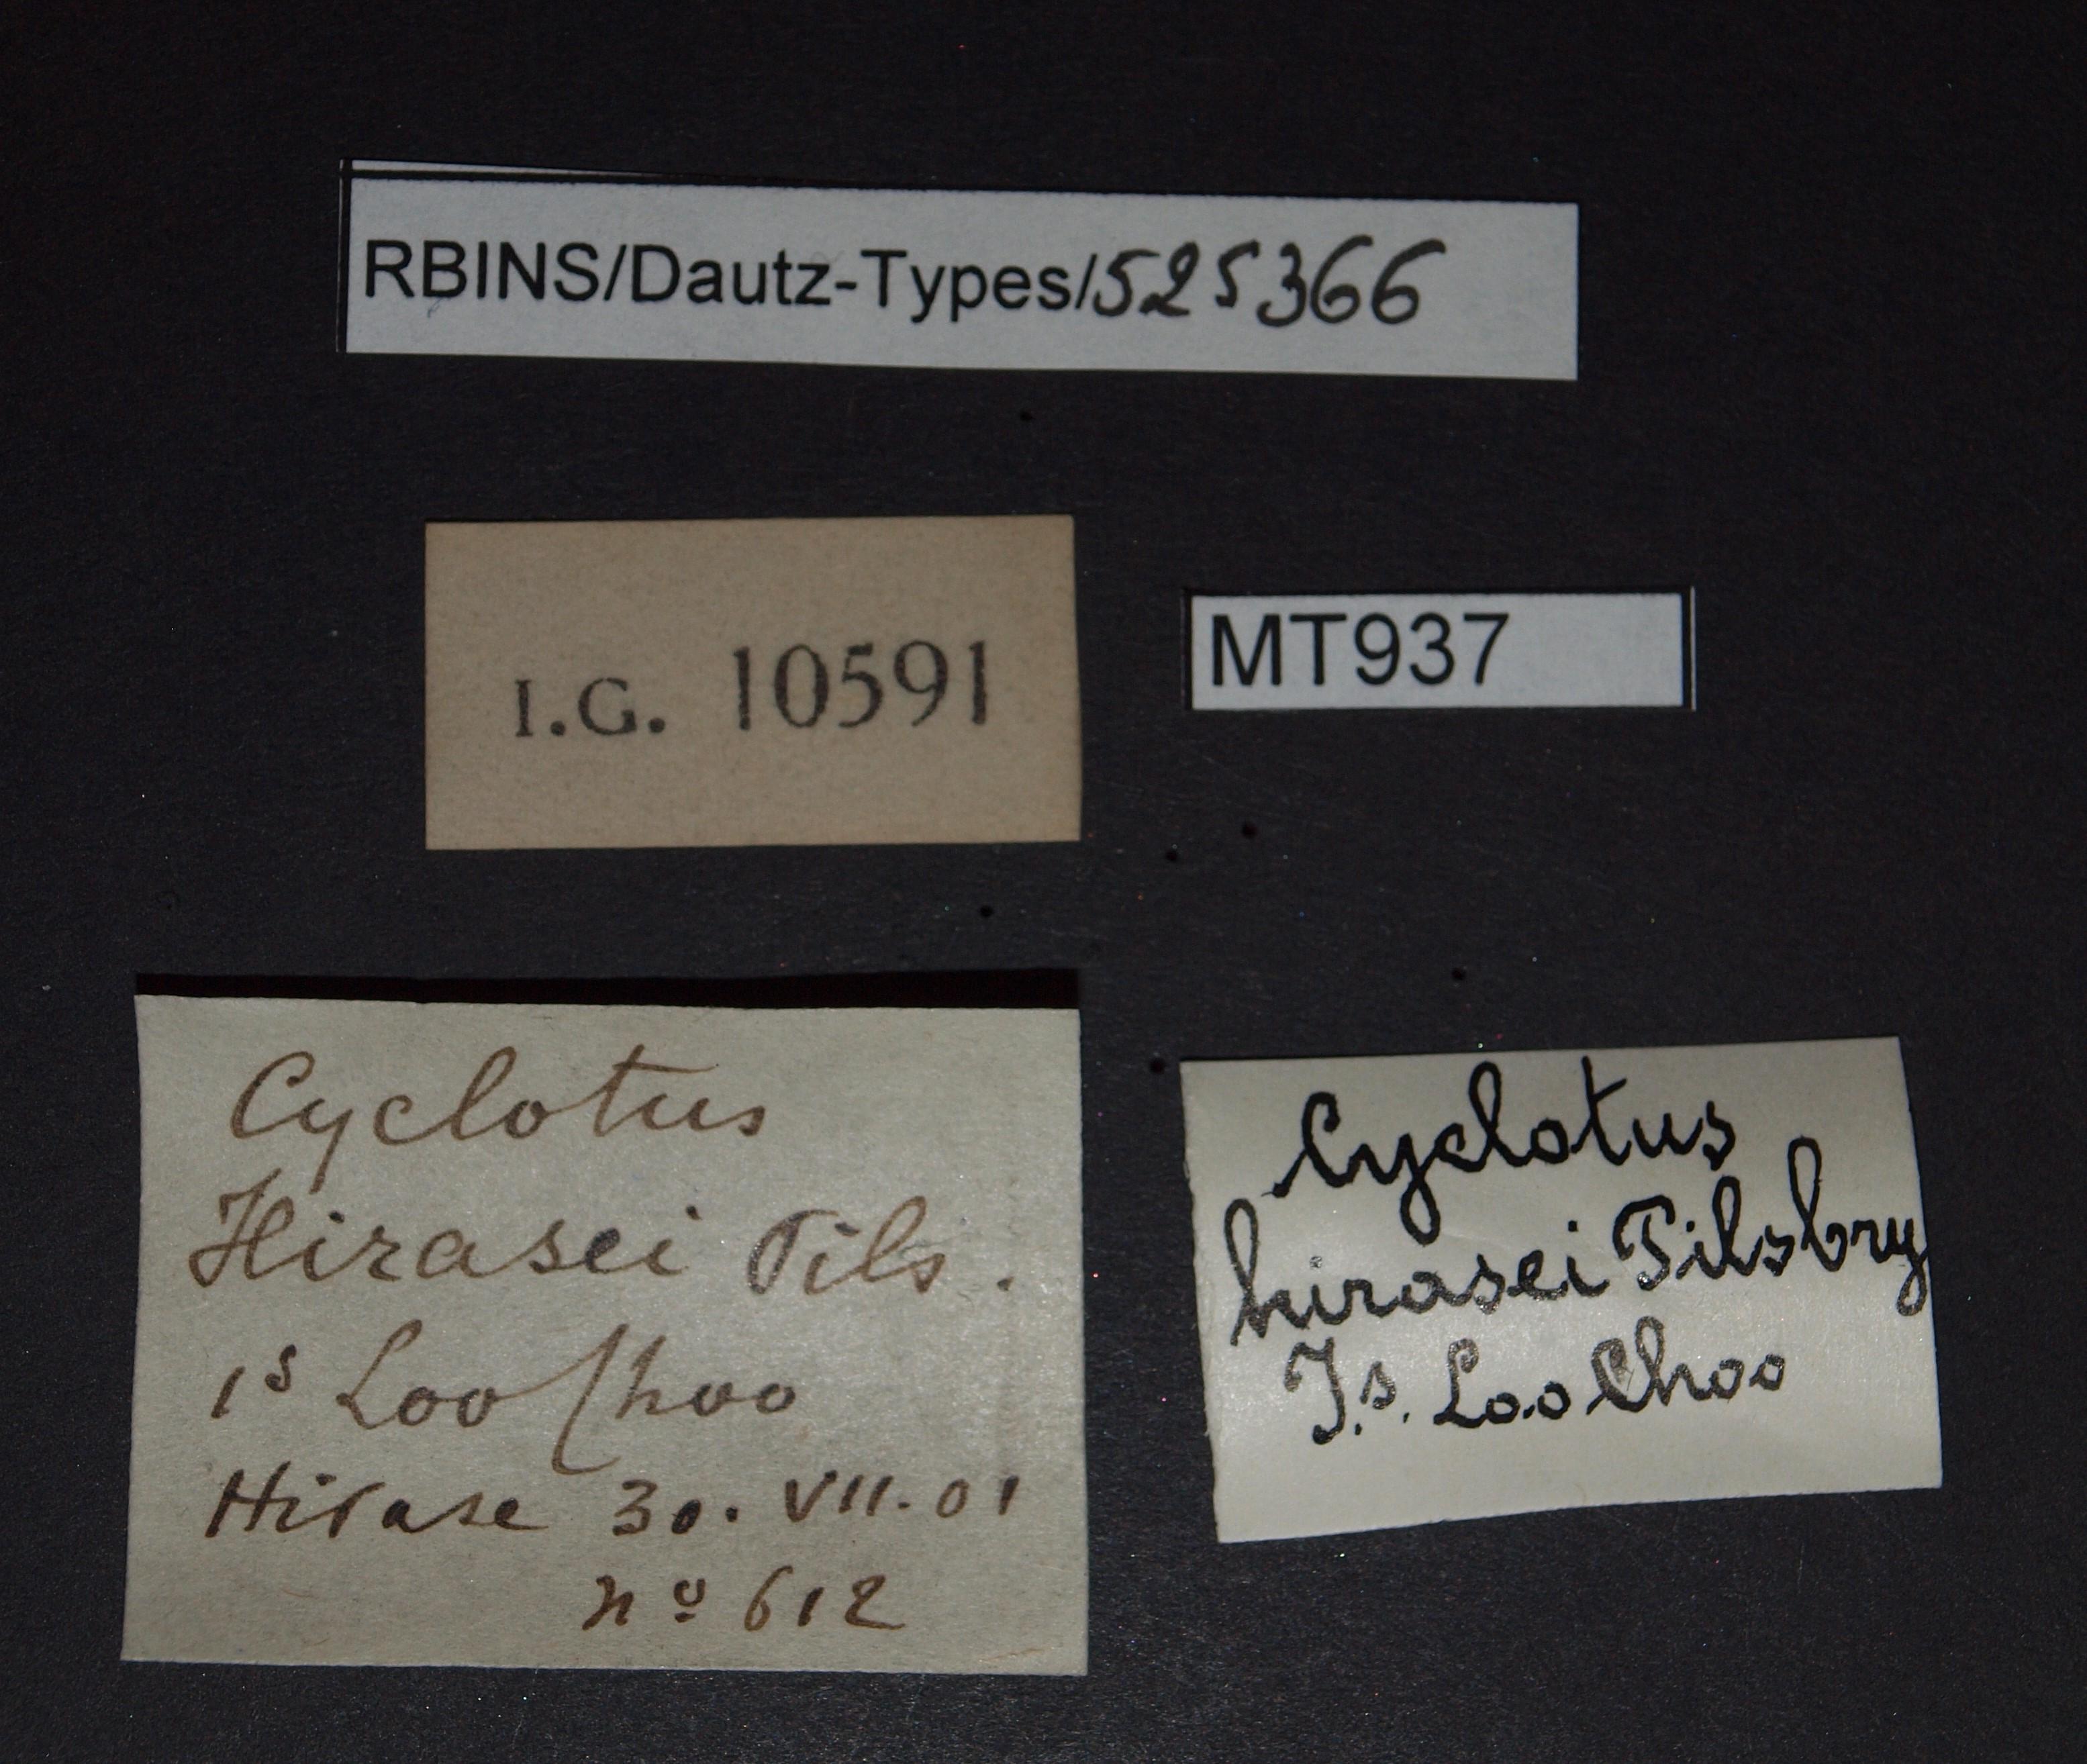 BE-RBINS-INV PARATYPE MT 937 Cyclotus hirasei LABELS.jpg